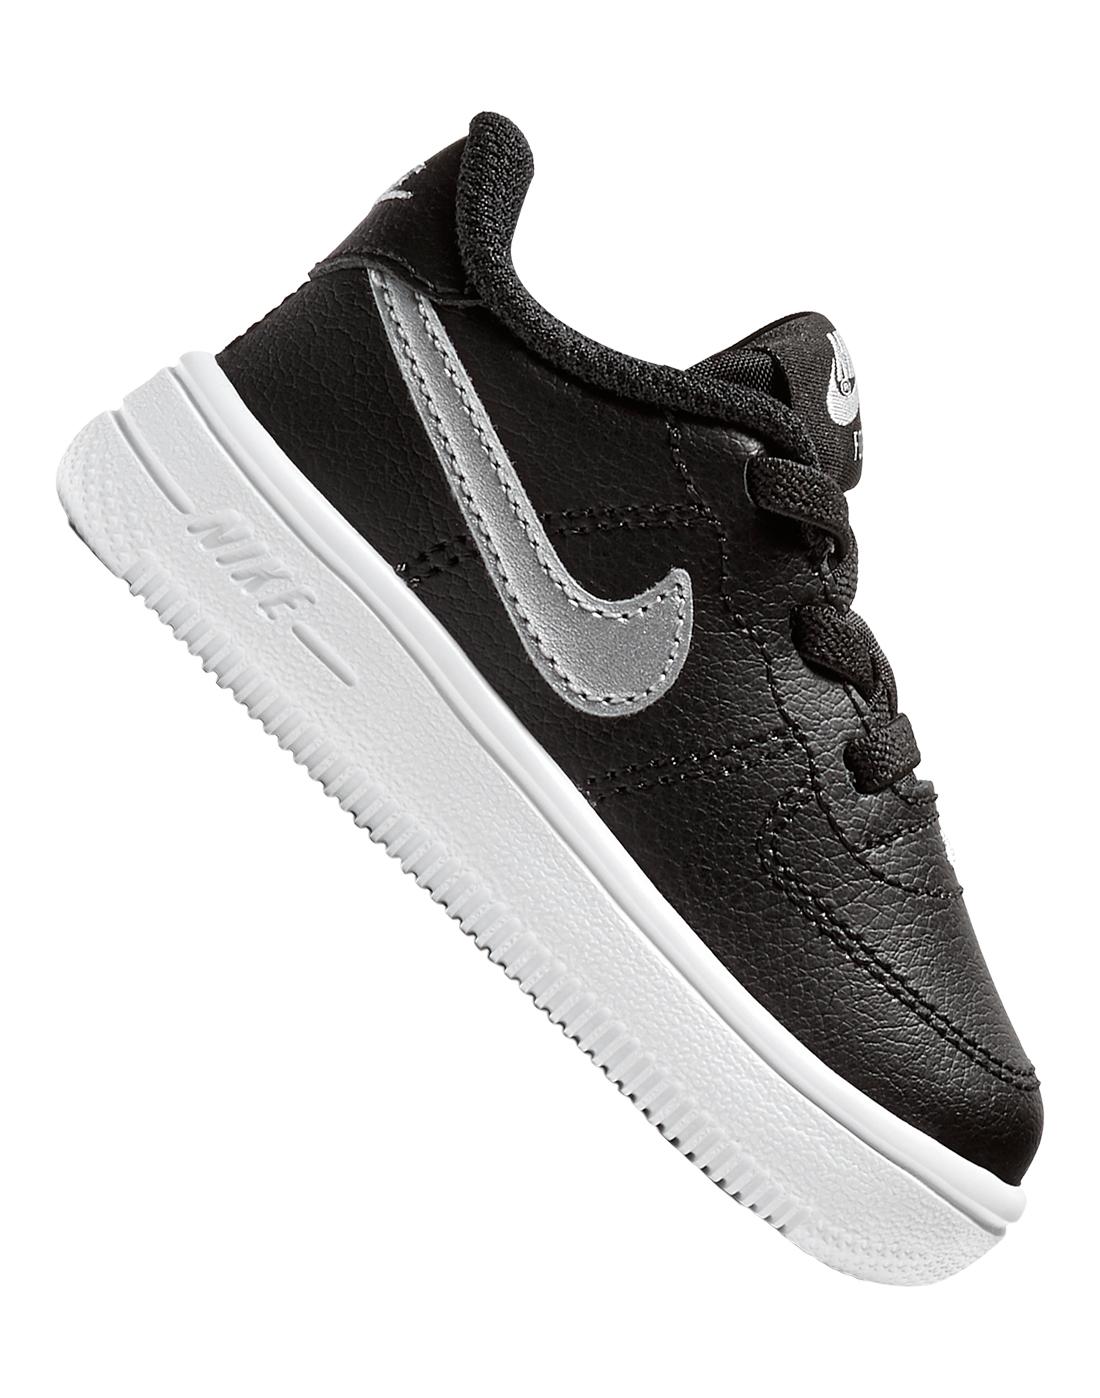 48e88d833bcde Infant Boys Black Nike Air Force 1